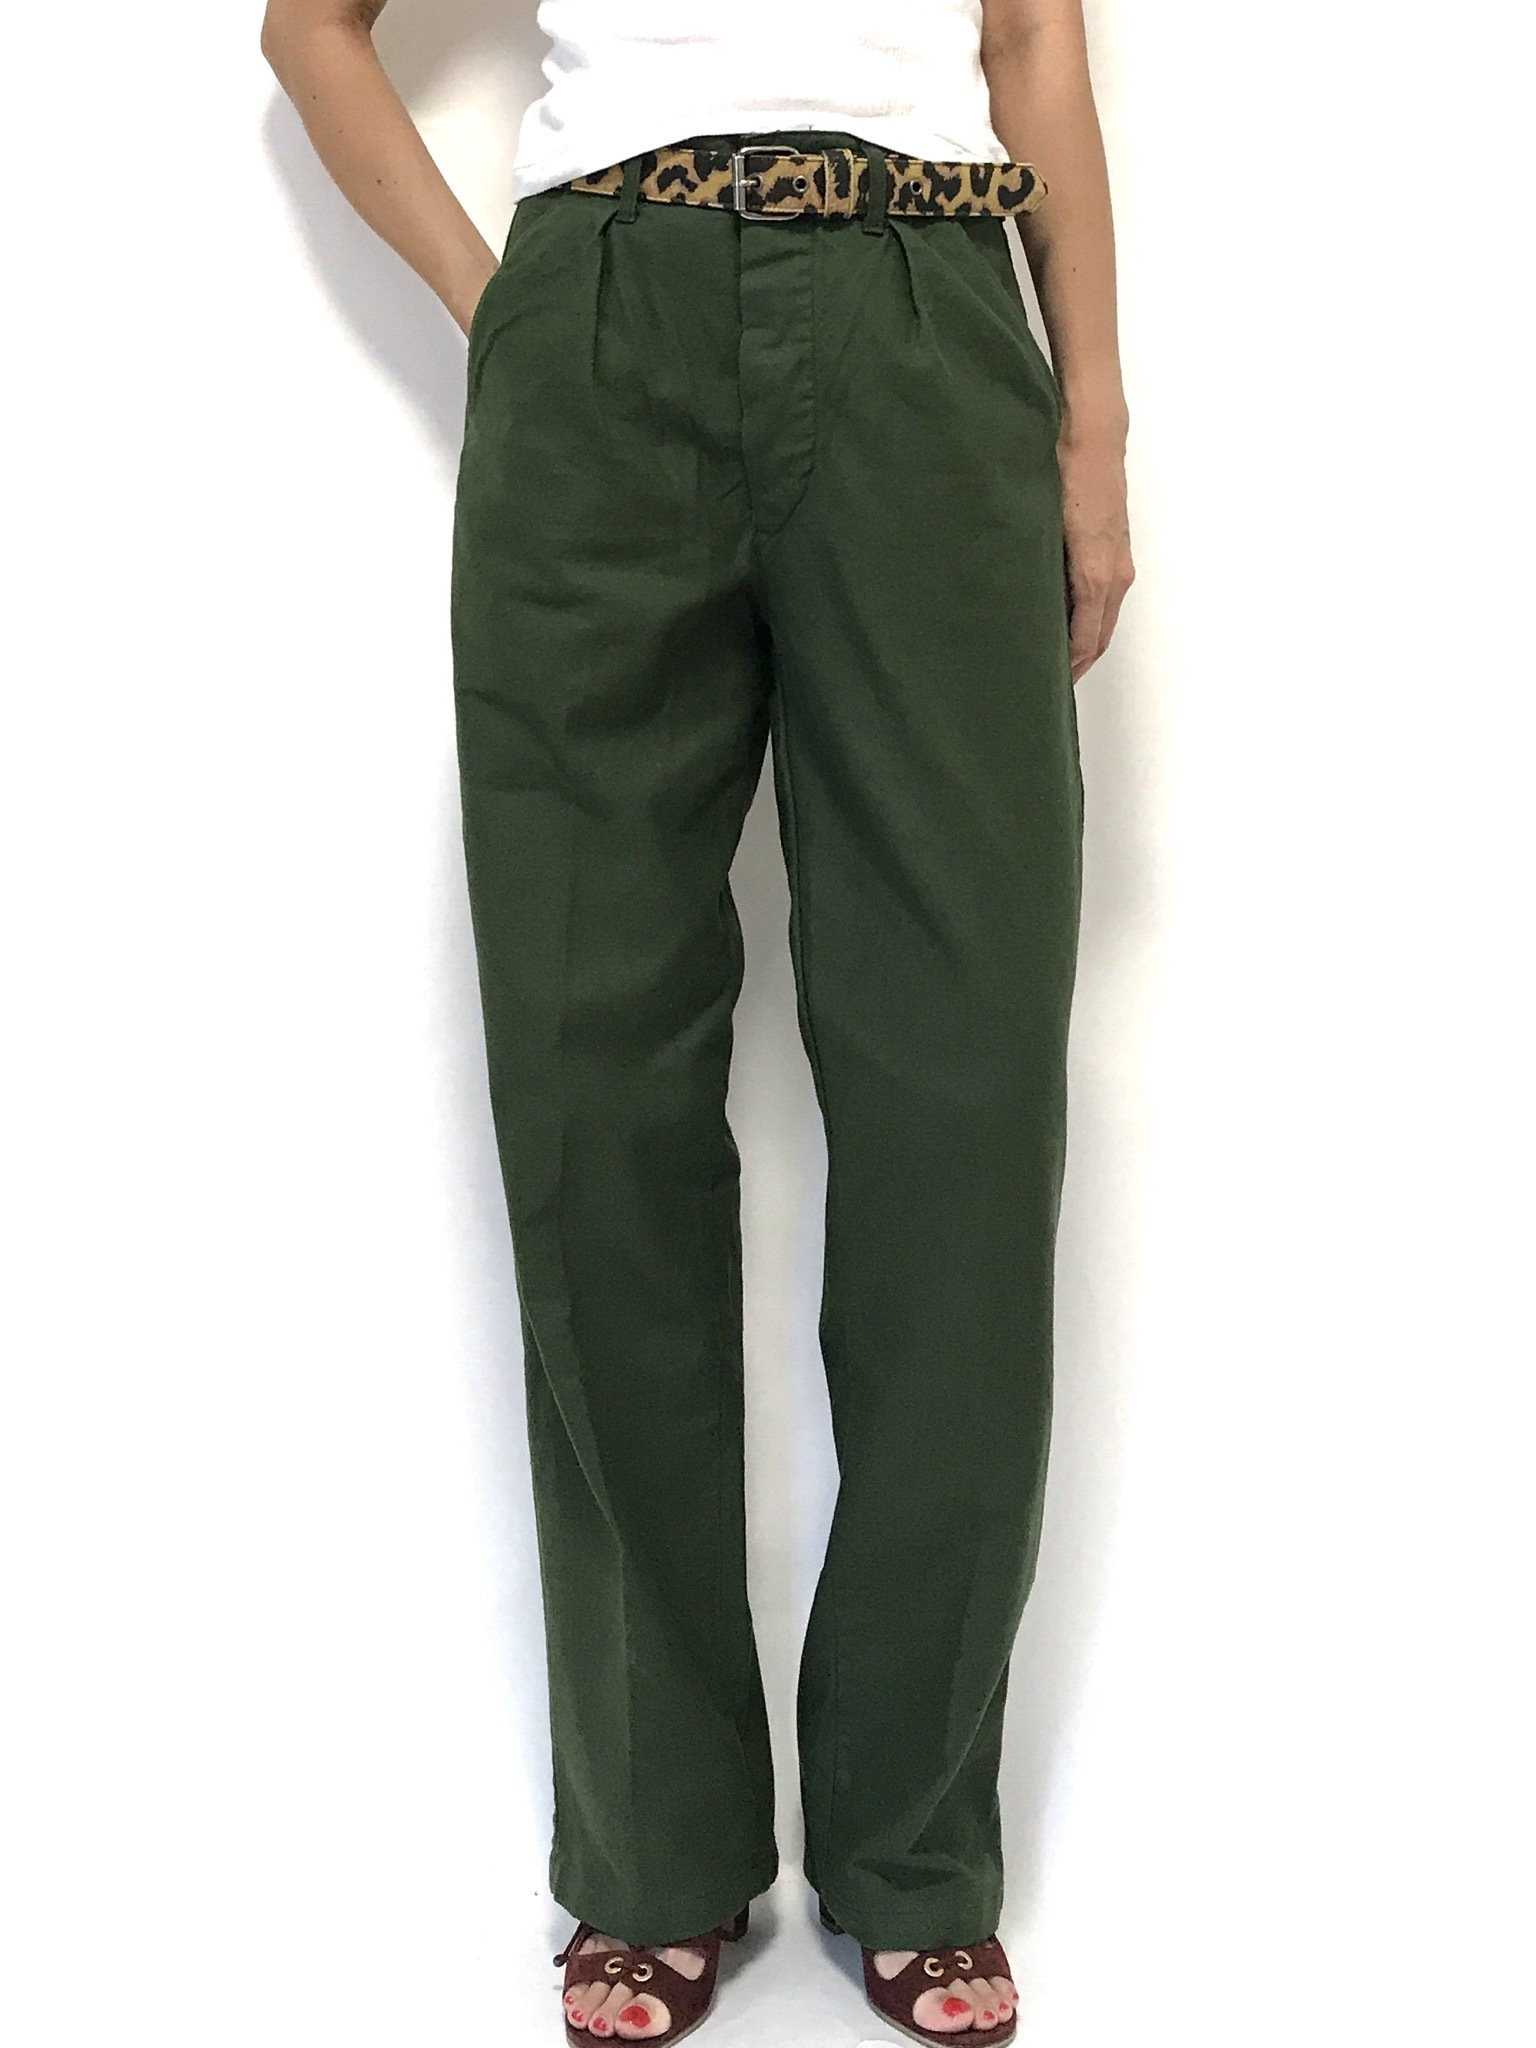 ③ 70's Swedish Army Utility Pants C44